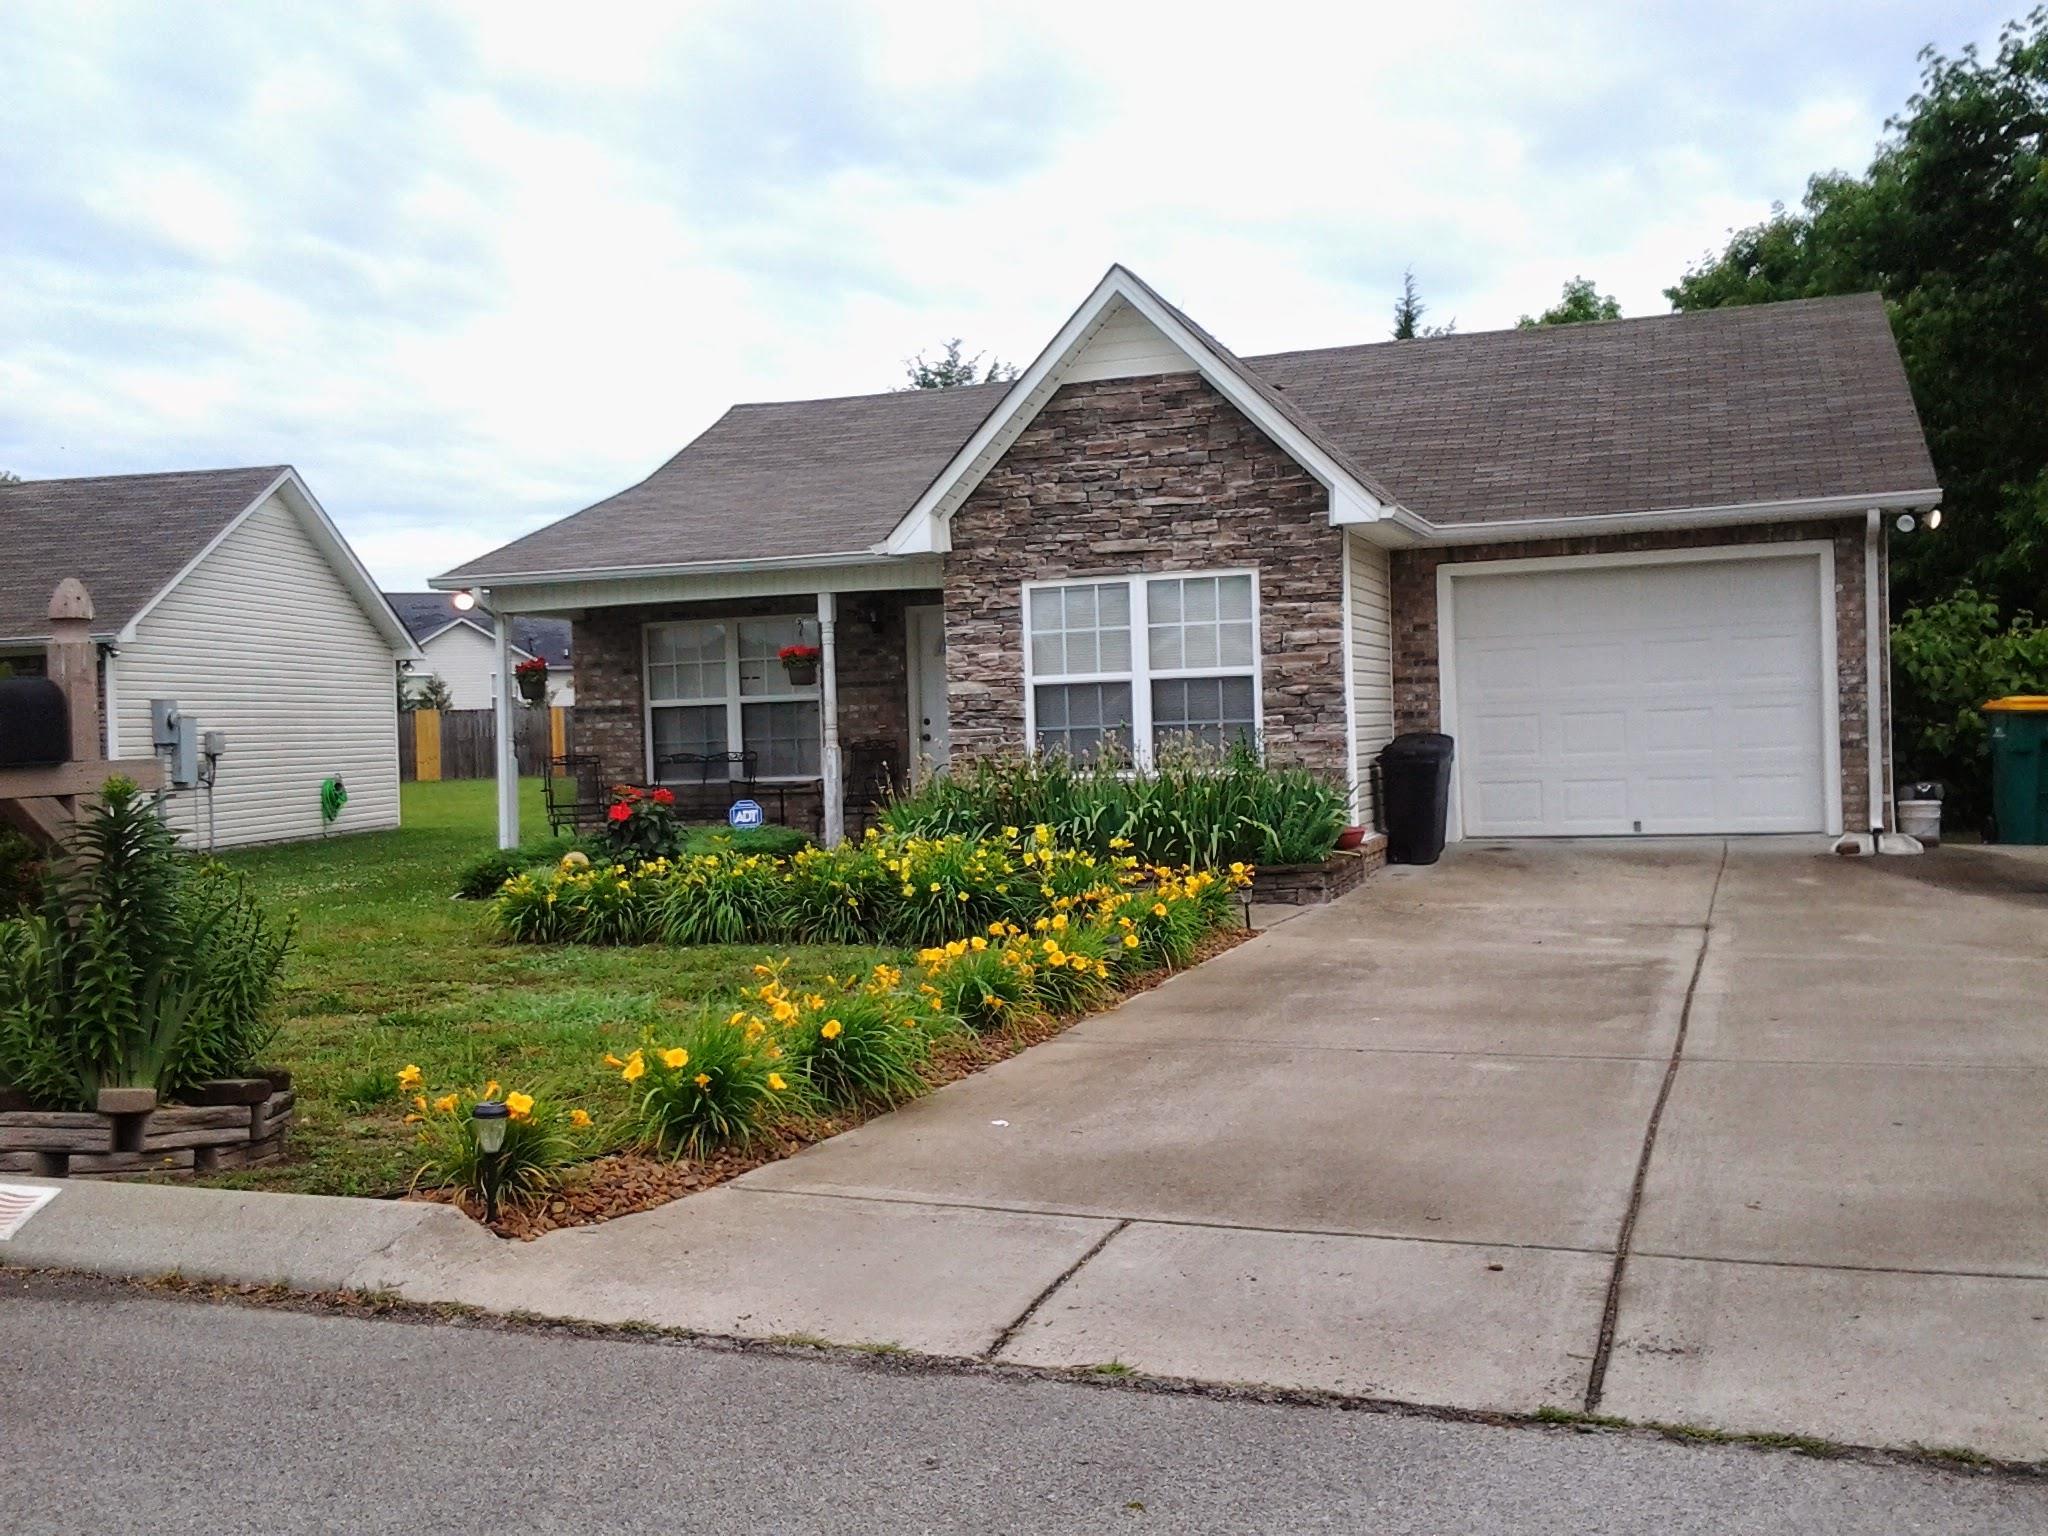 2027 Golden Ct, Spring Hill, TN 37174